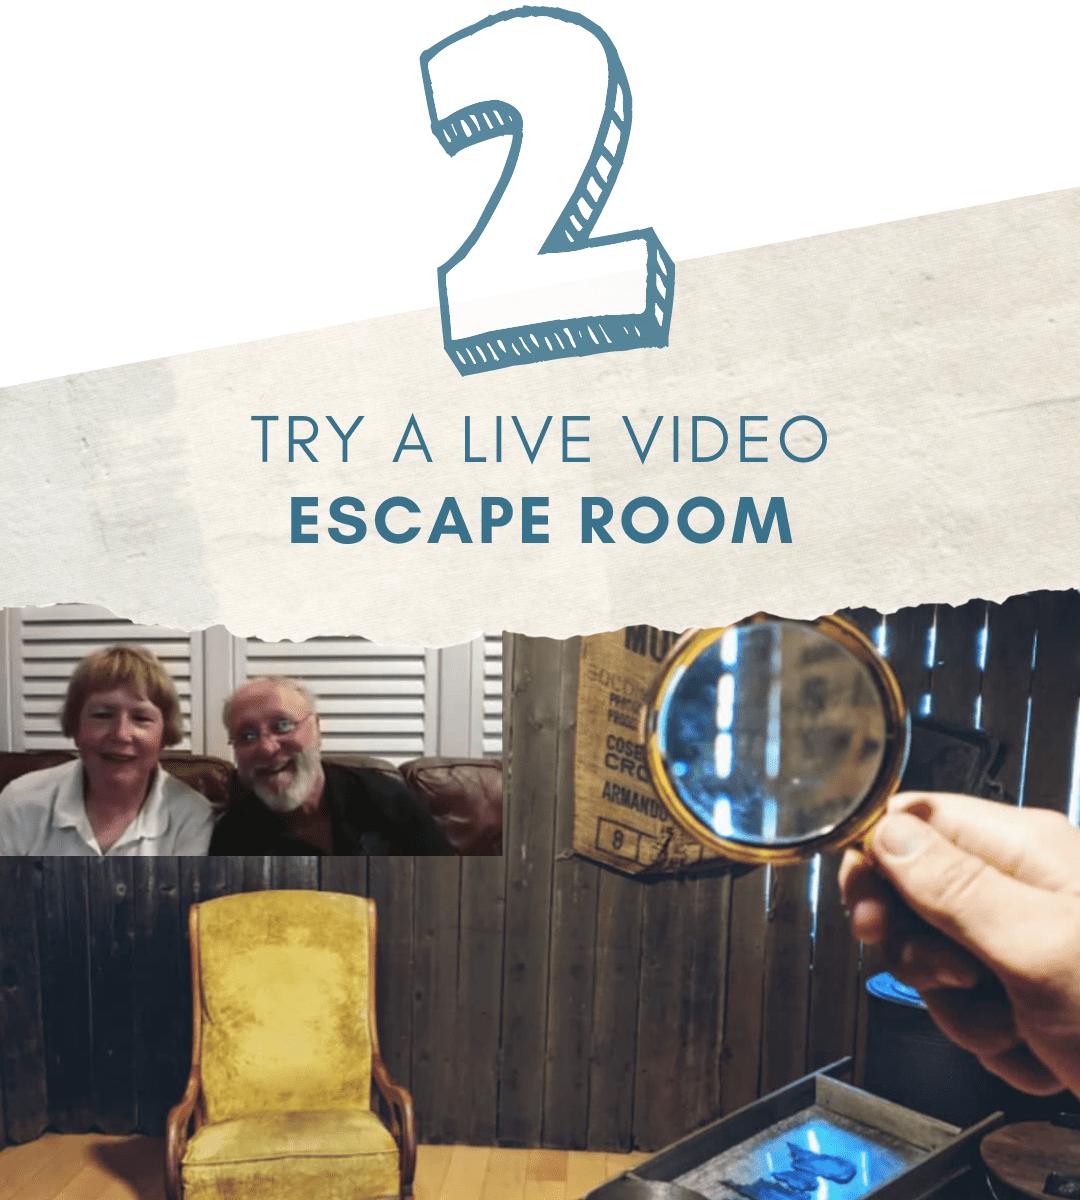 try live vido escape room